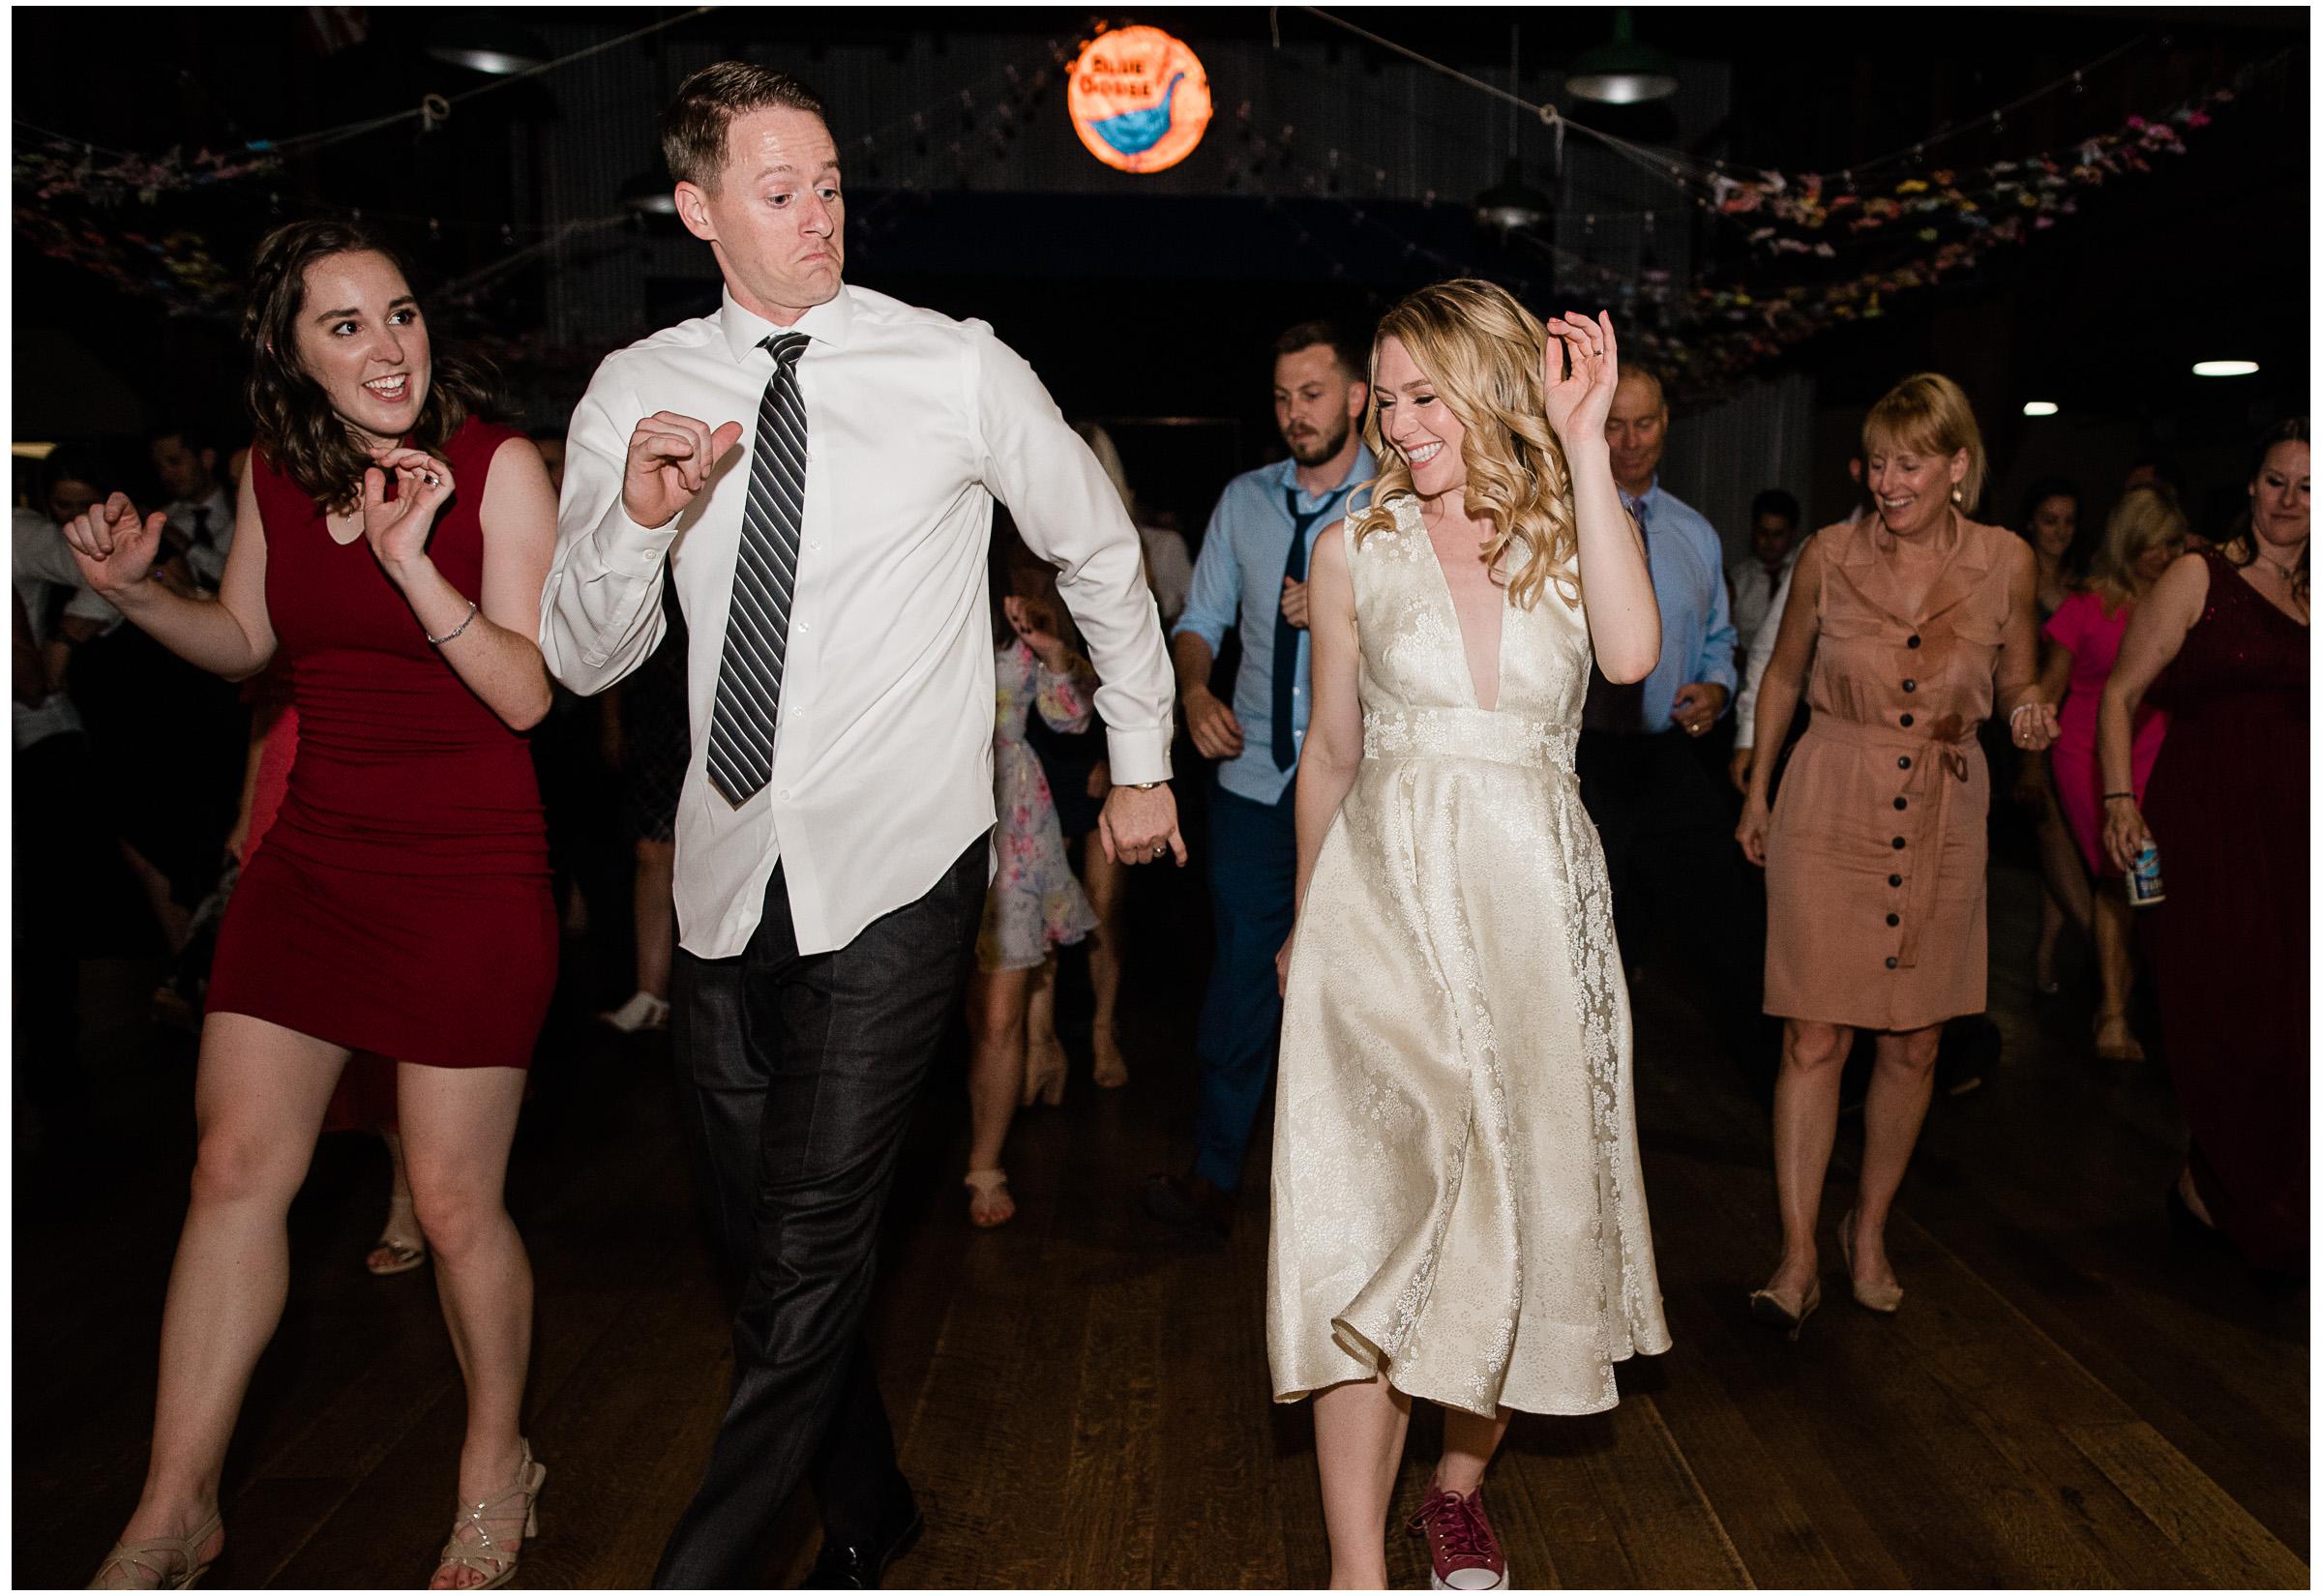 Loomis Wedding - Sacramento Photographer - Blue Goose - Justin Wilcox Photography - 24.jpg